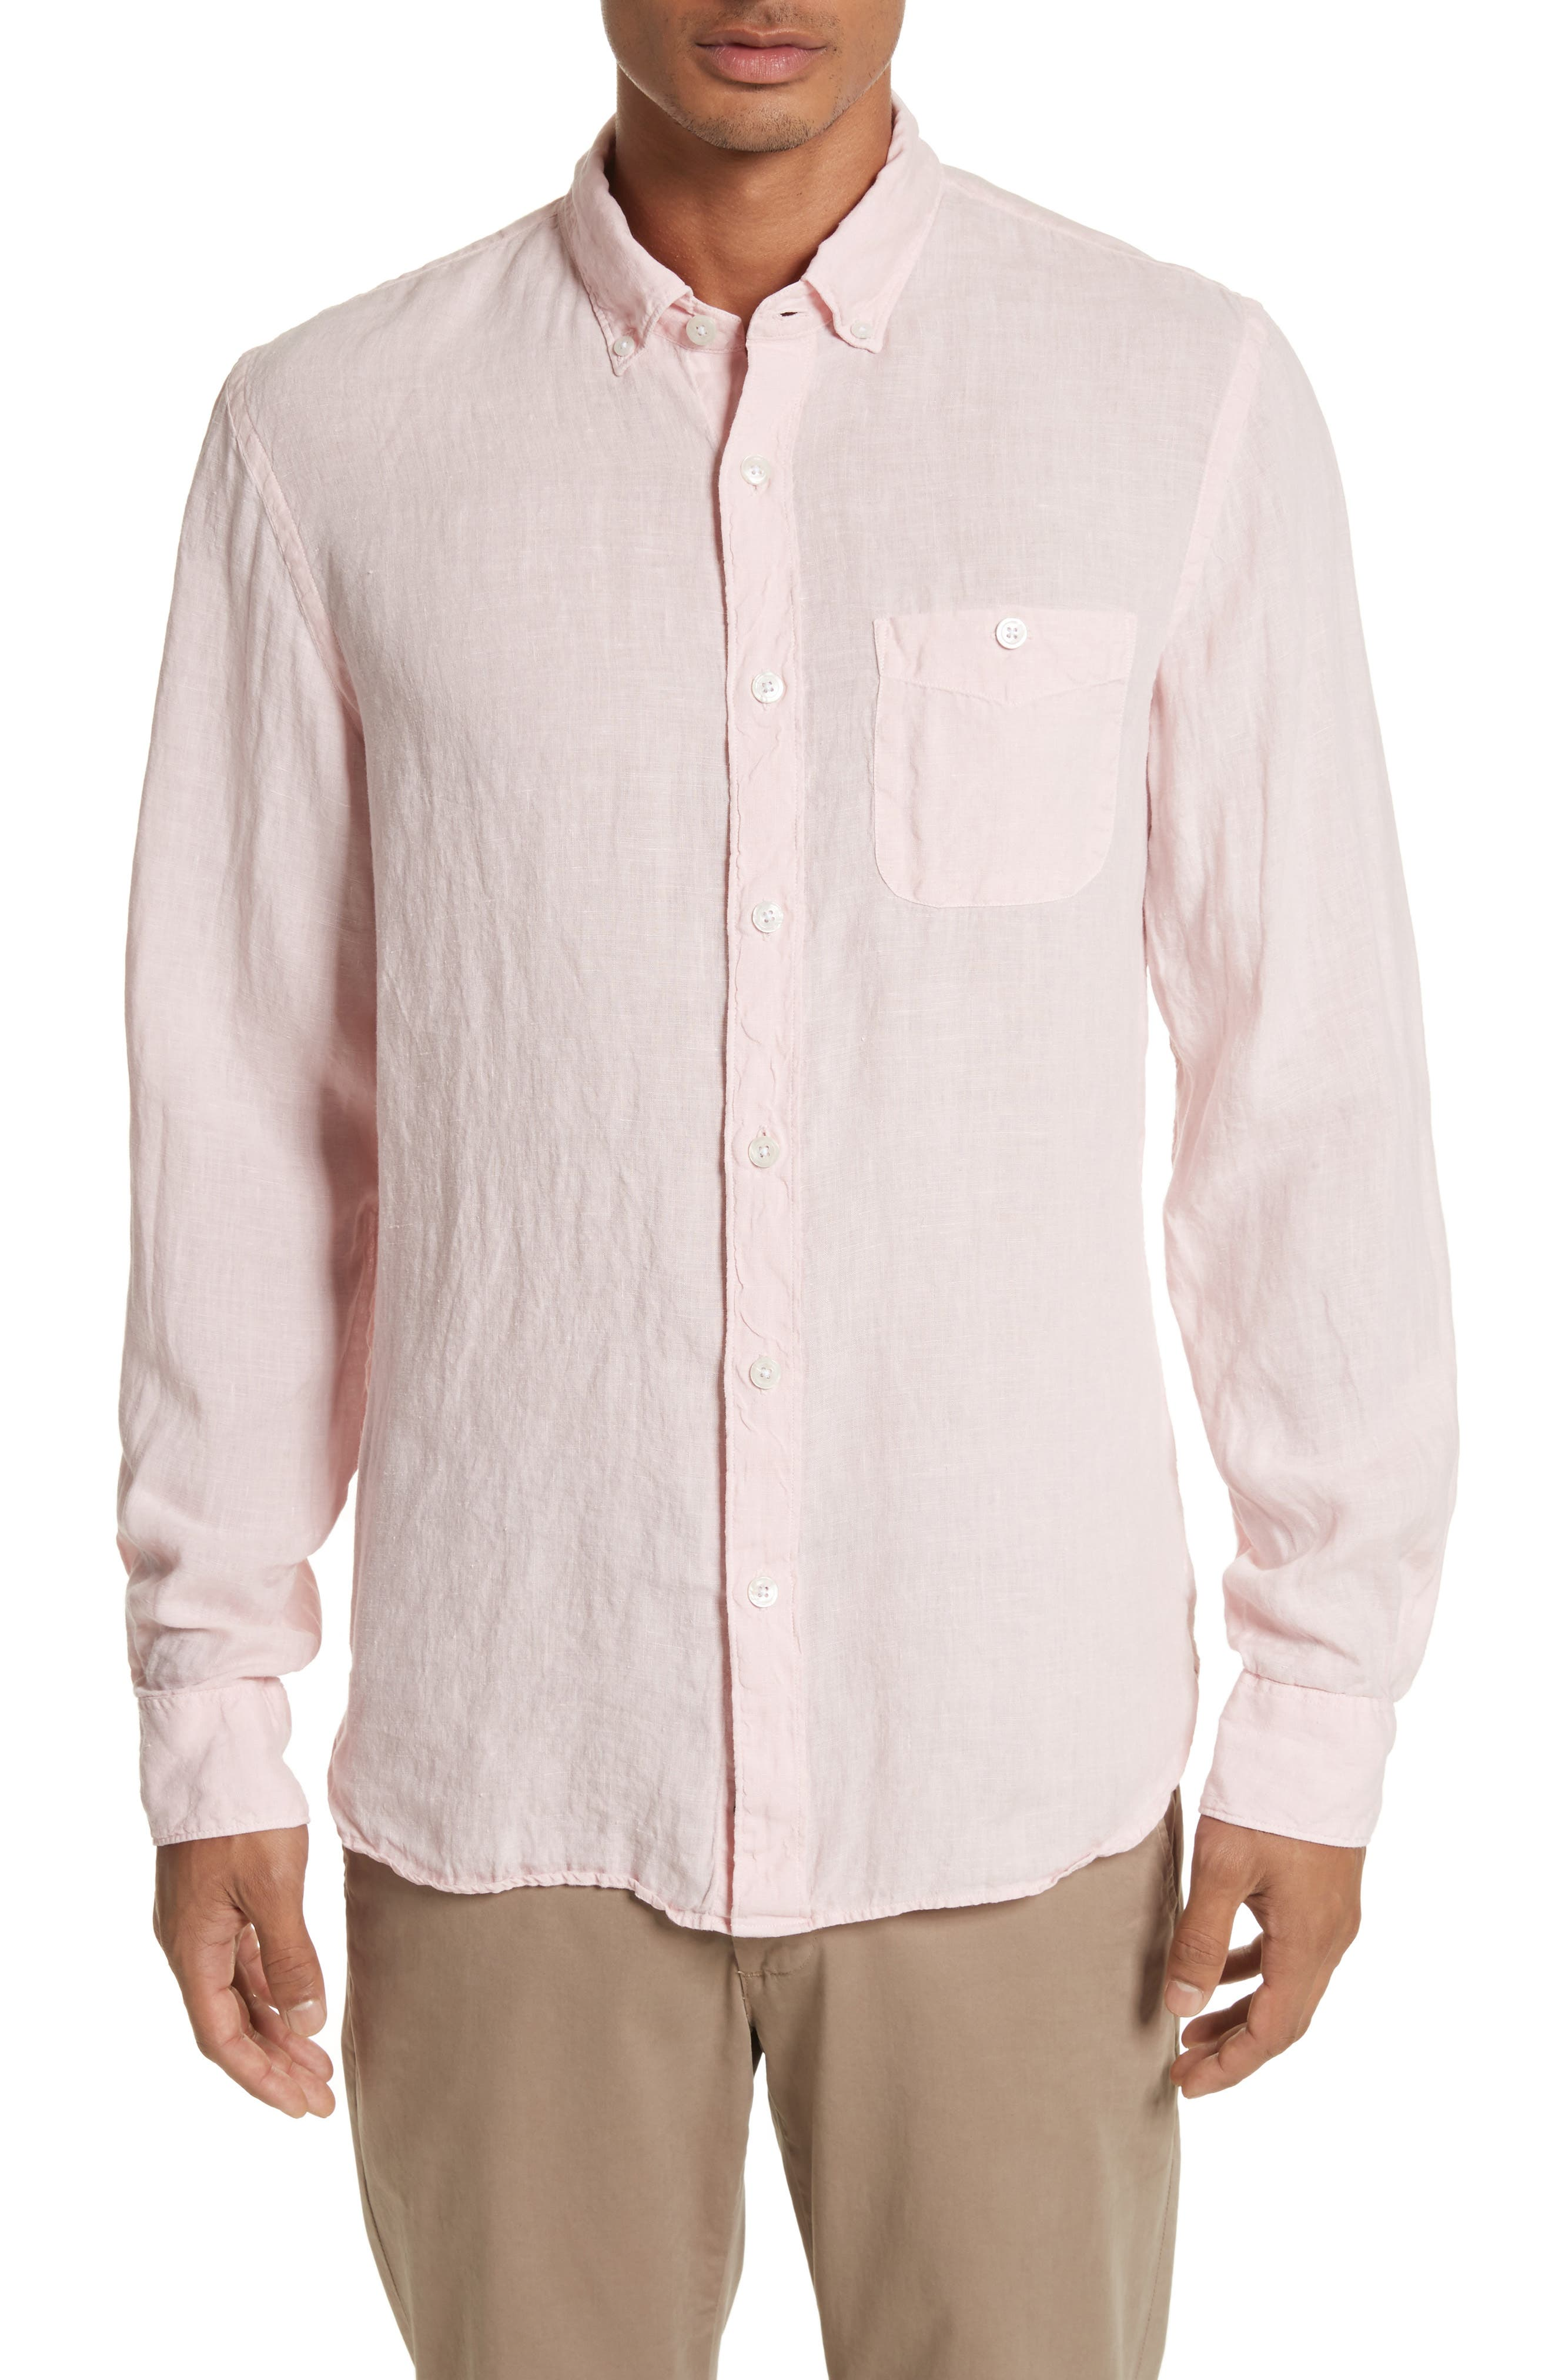 Alternate Image 1 Selected - Todd Snyder Linen Woven Shirt